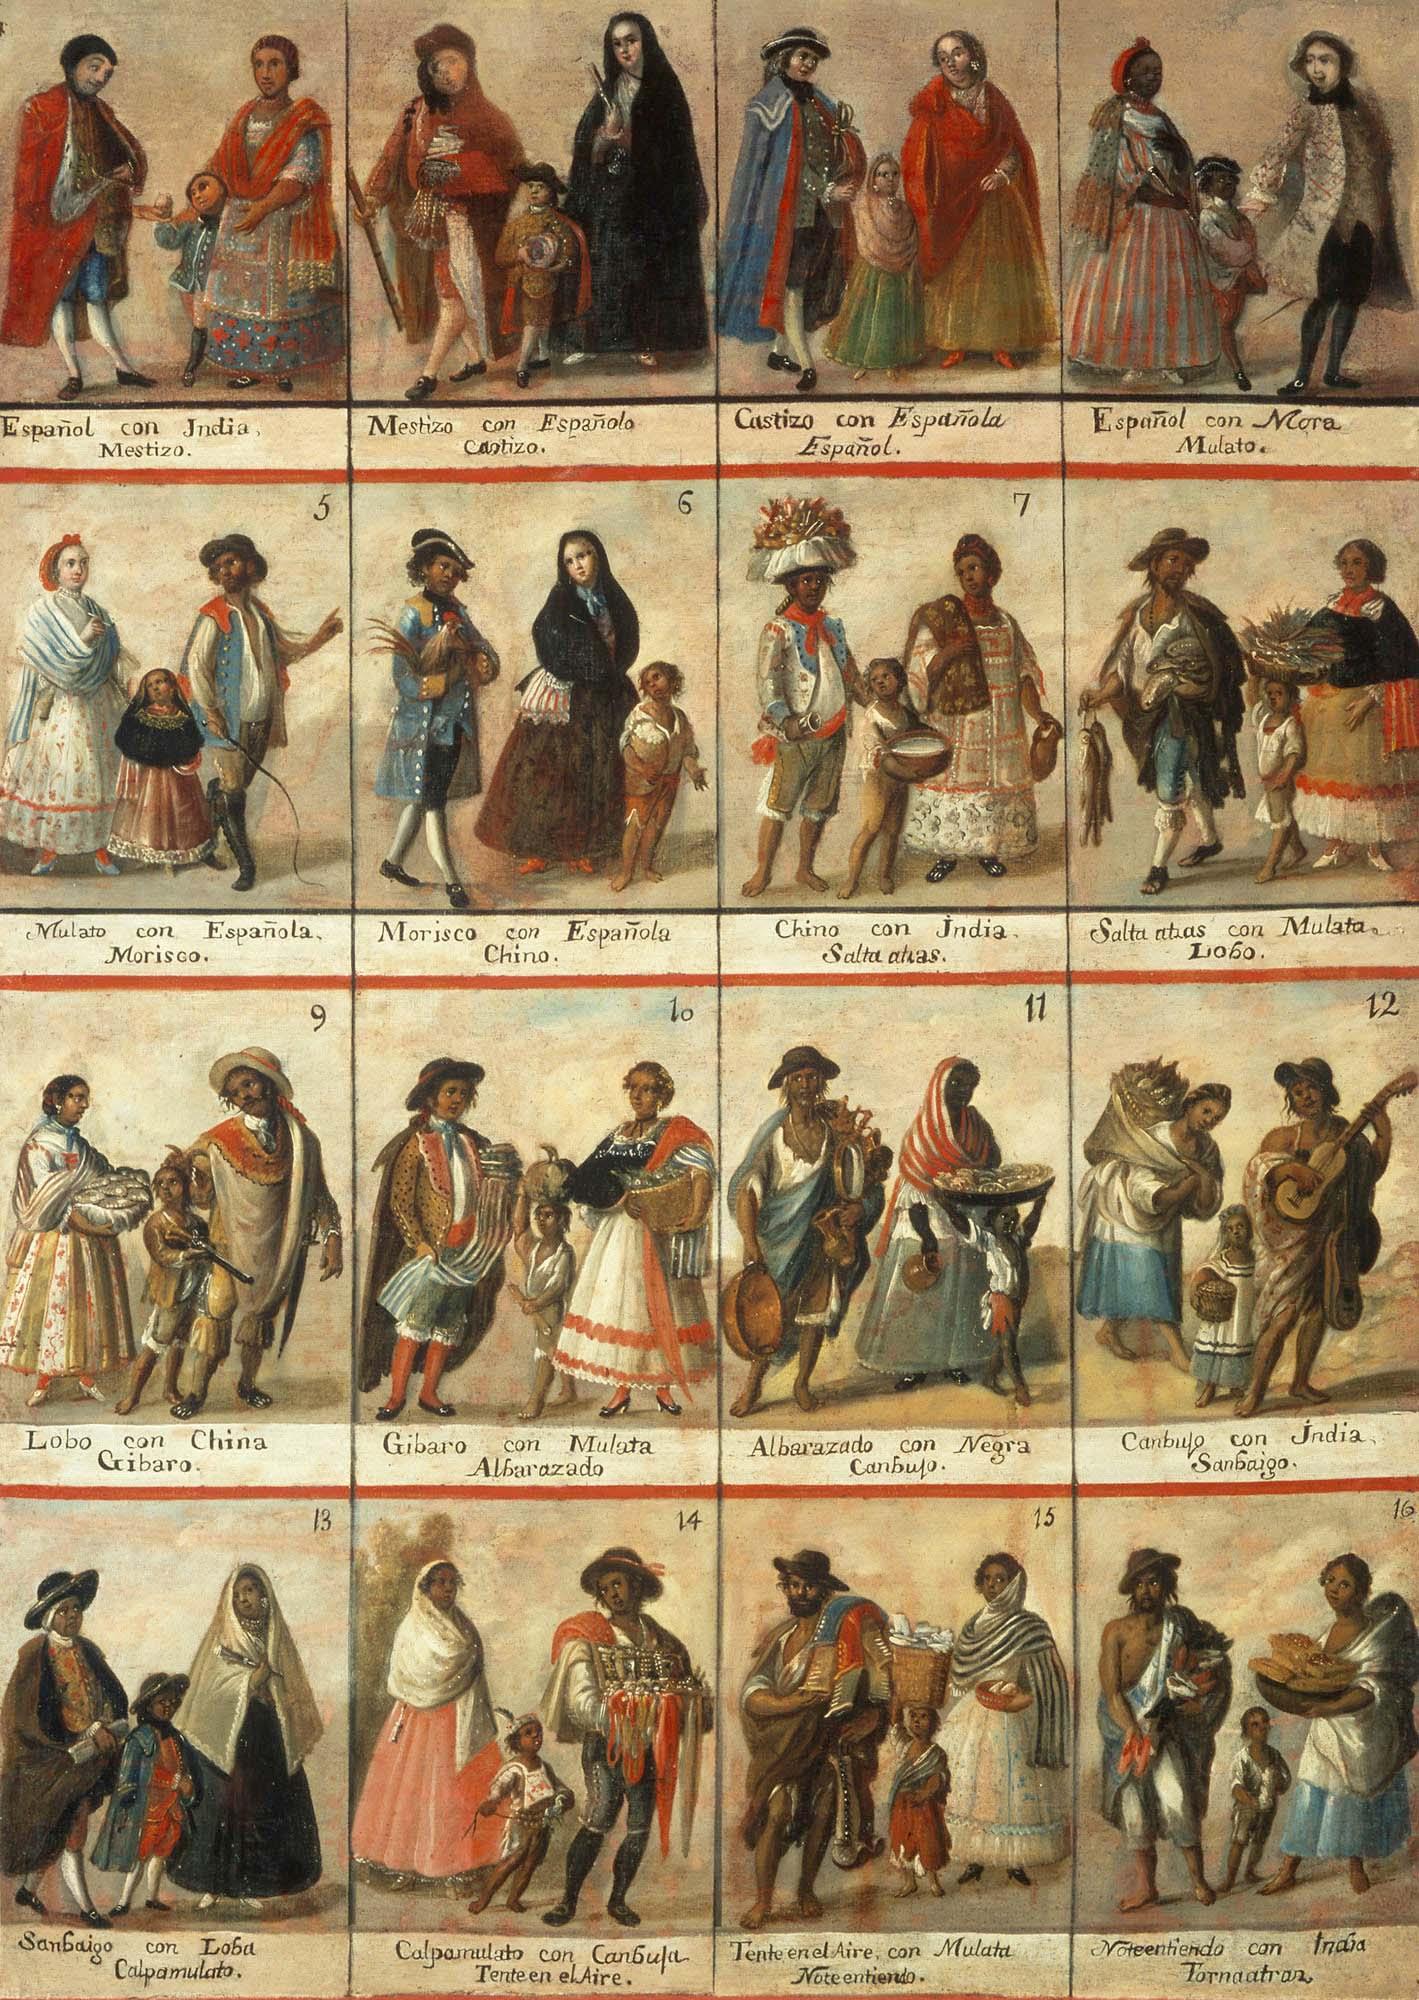 Diferentes fenotipos y grupos étnicos de Latinoamérica - Página 4 CastasEnLaNuevaEspana